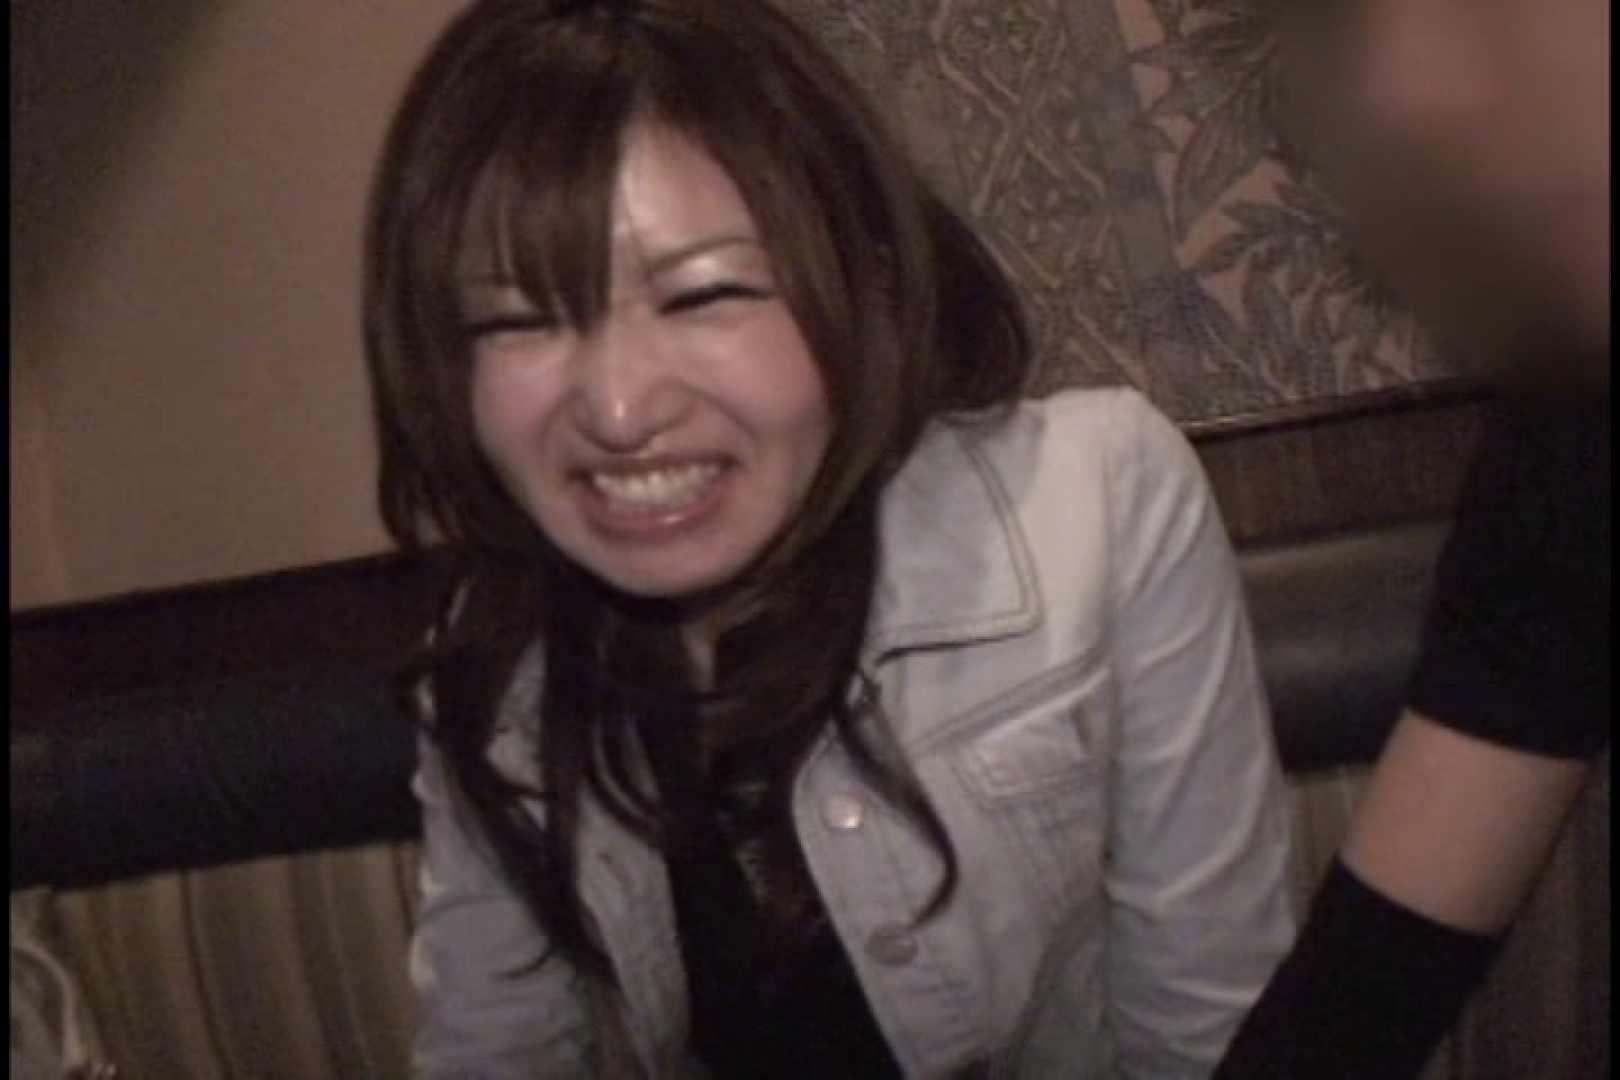 JDハンター全国ツアー vol.042 後編 女子大生のエロ動画  104PIX 26